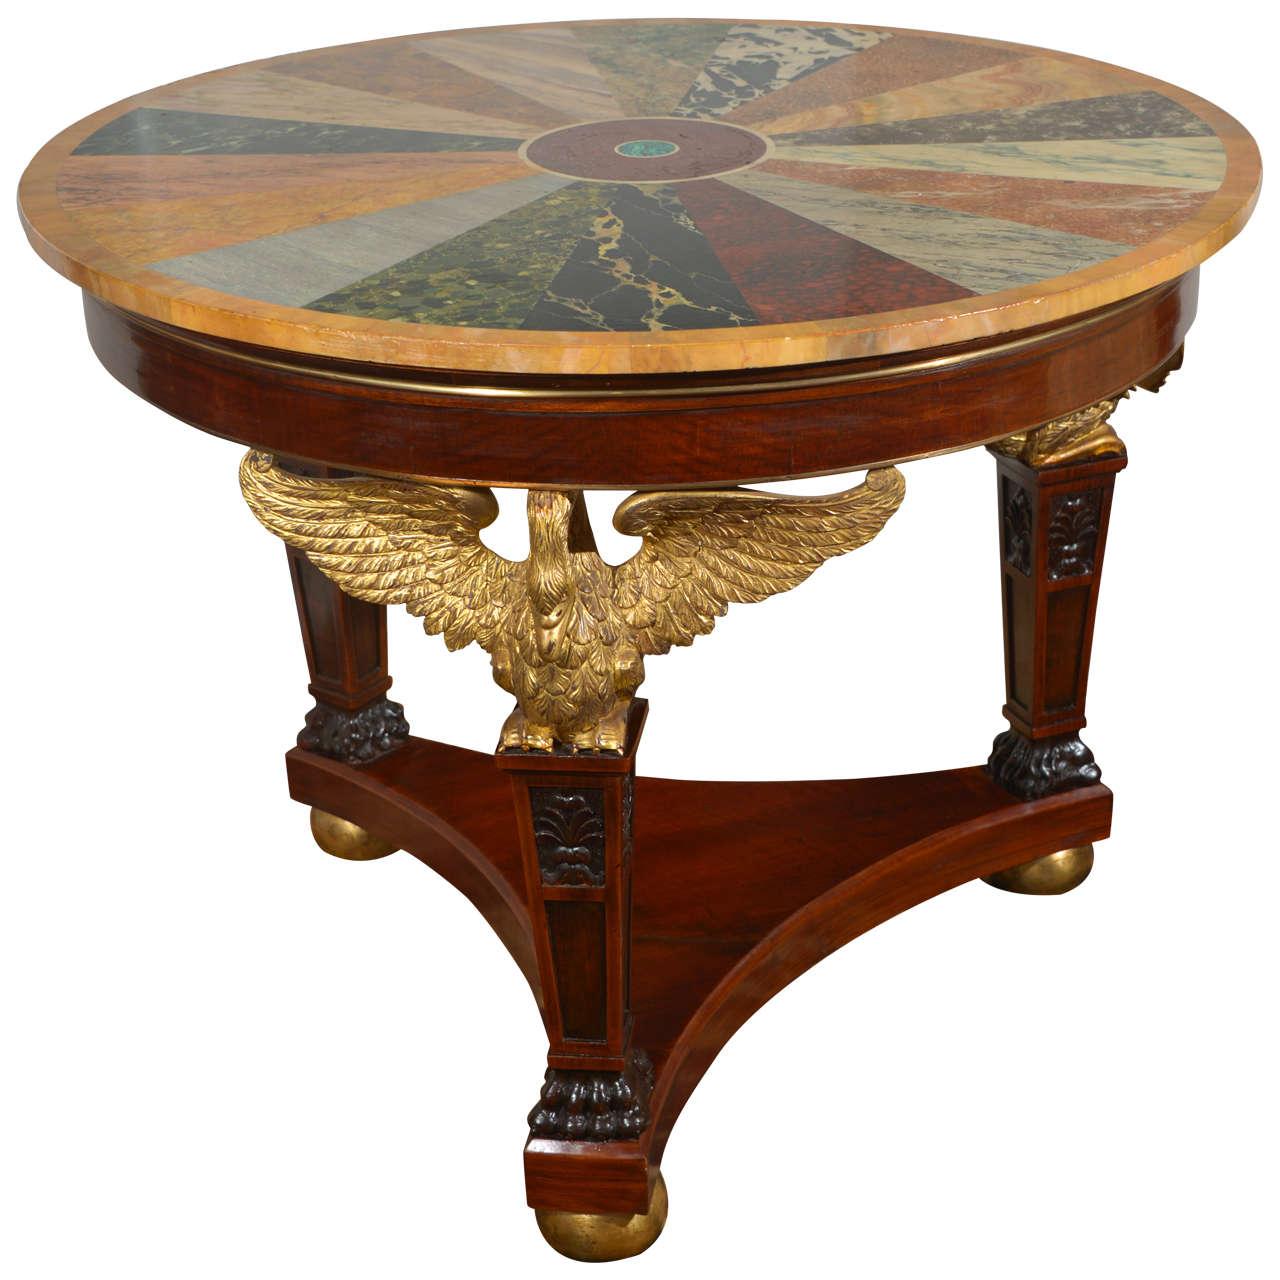 Runder Tisch im Empire-Stil, 19. Jahrhundert